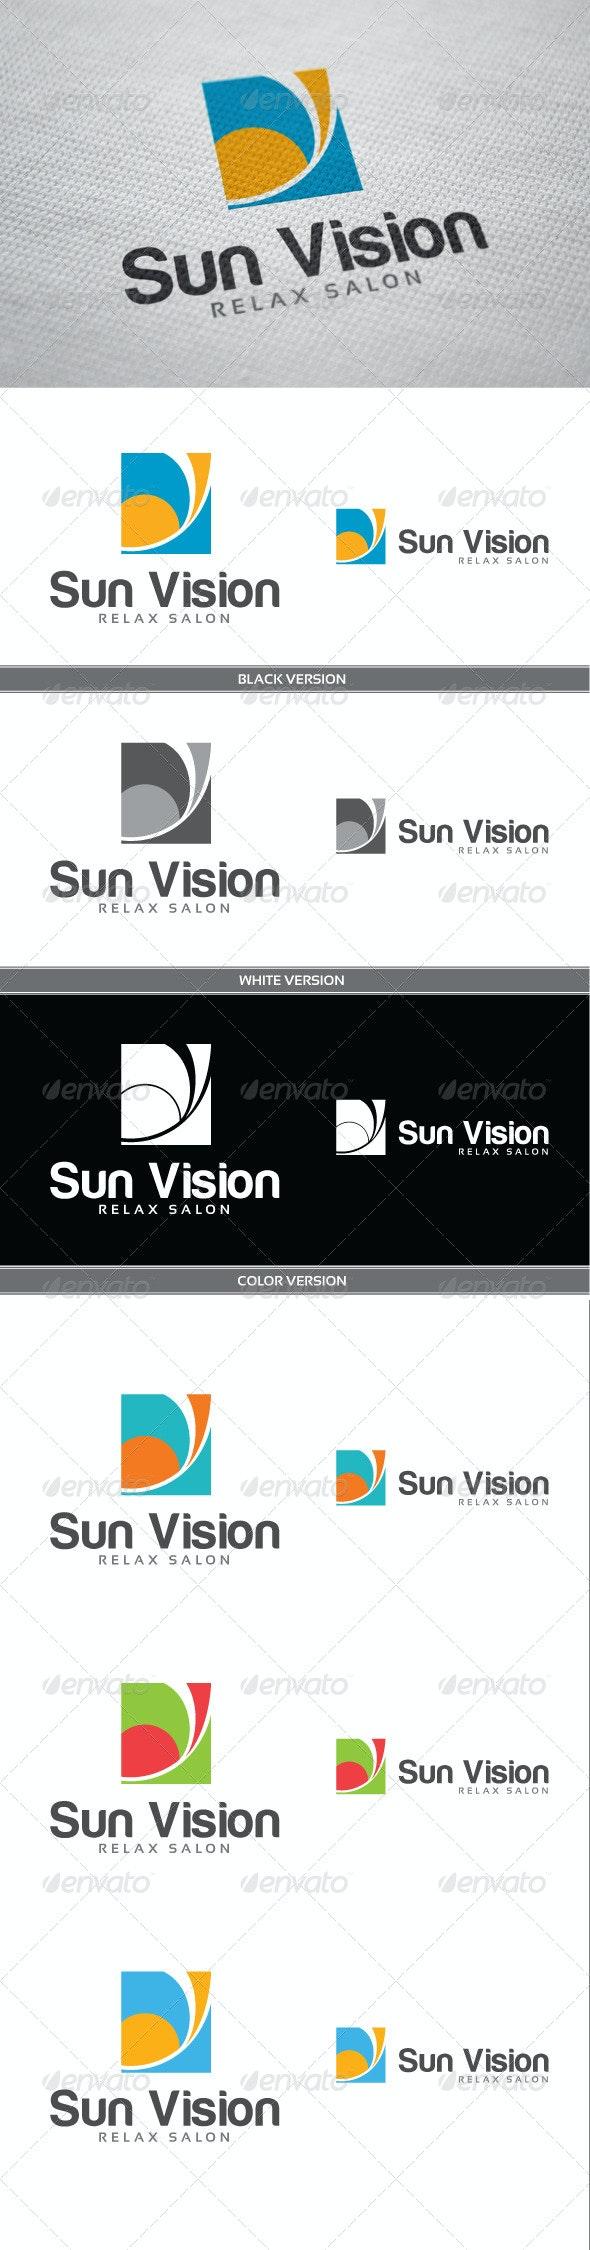 Sun Vision - Vector Abstract